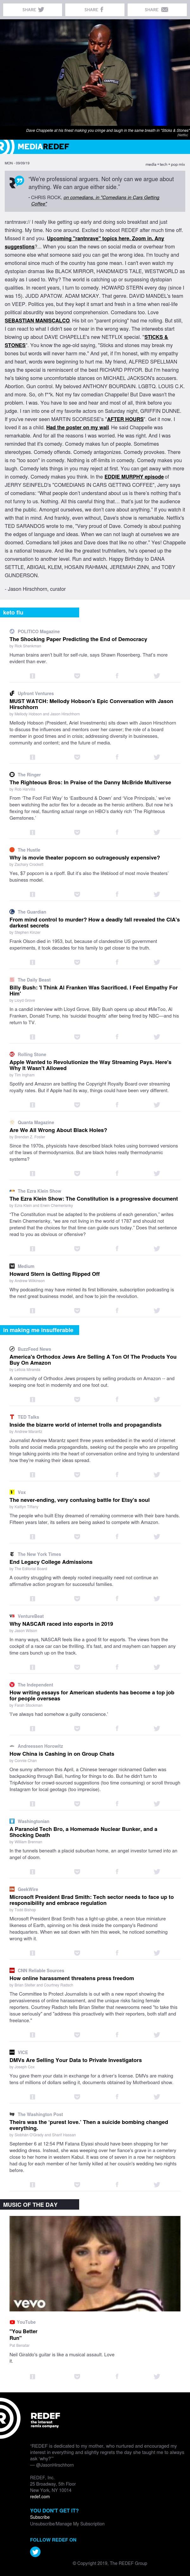 jason hirschhorn's @MediaREDEF: 09/09/2019 - Dave Chappelle's Gift, End of Democracy, Danny McBride's Genius, Movie Popcorn, Billy Bush, Black Holes, Steaming Pays...